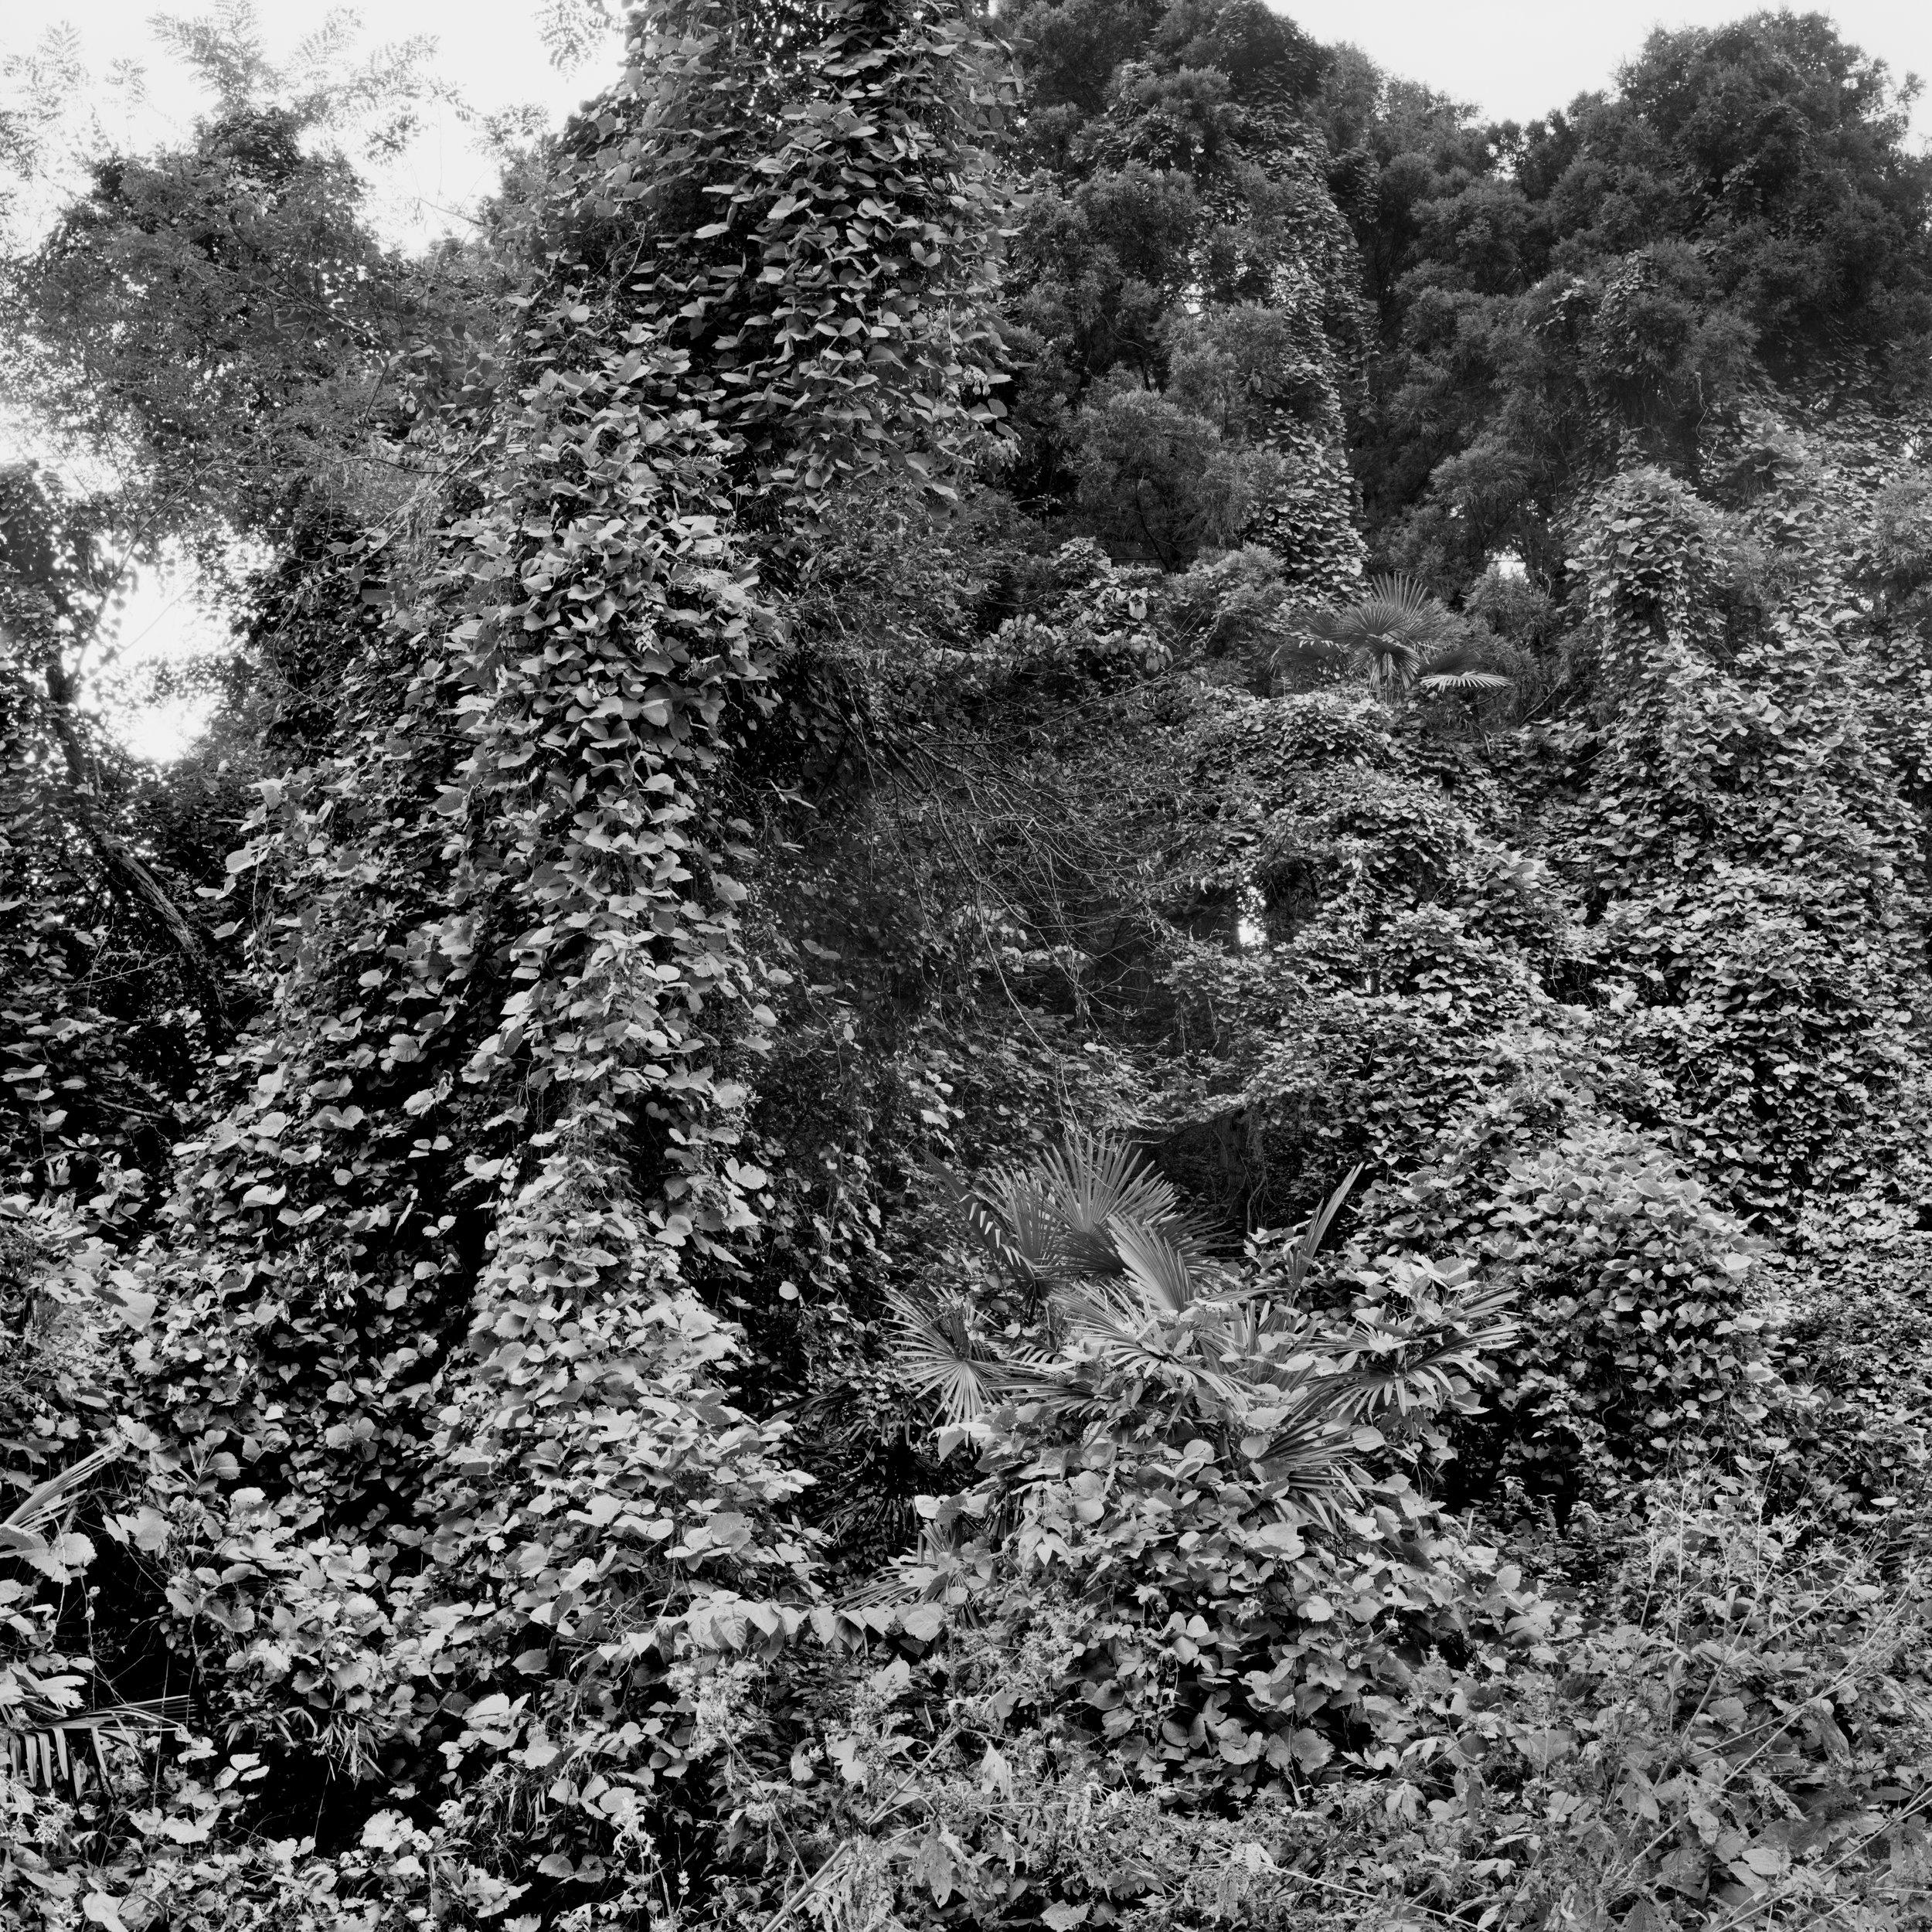 woodland45_004.jpg